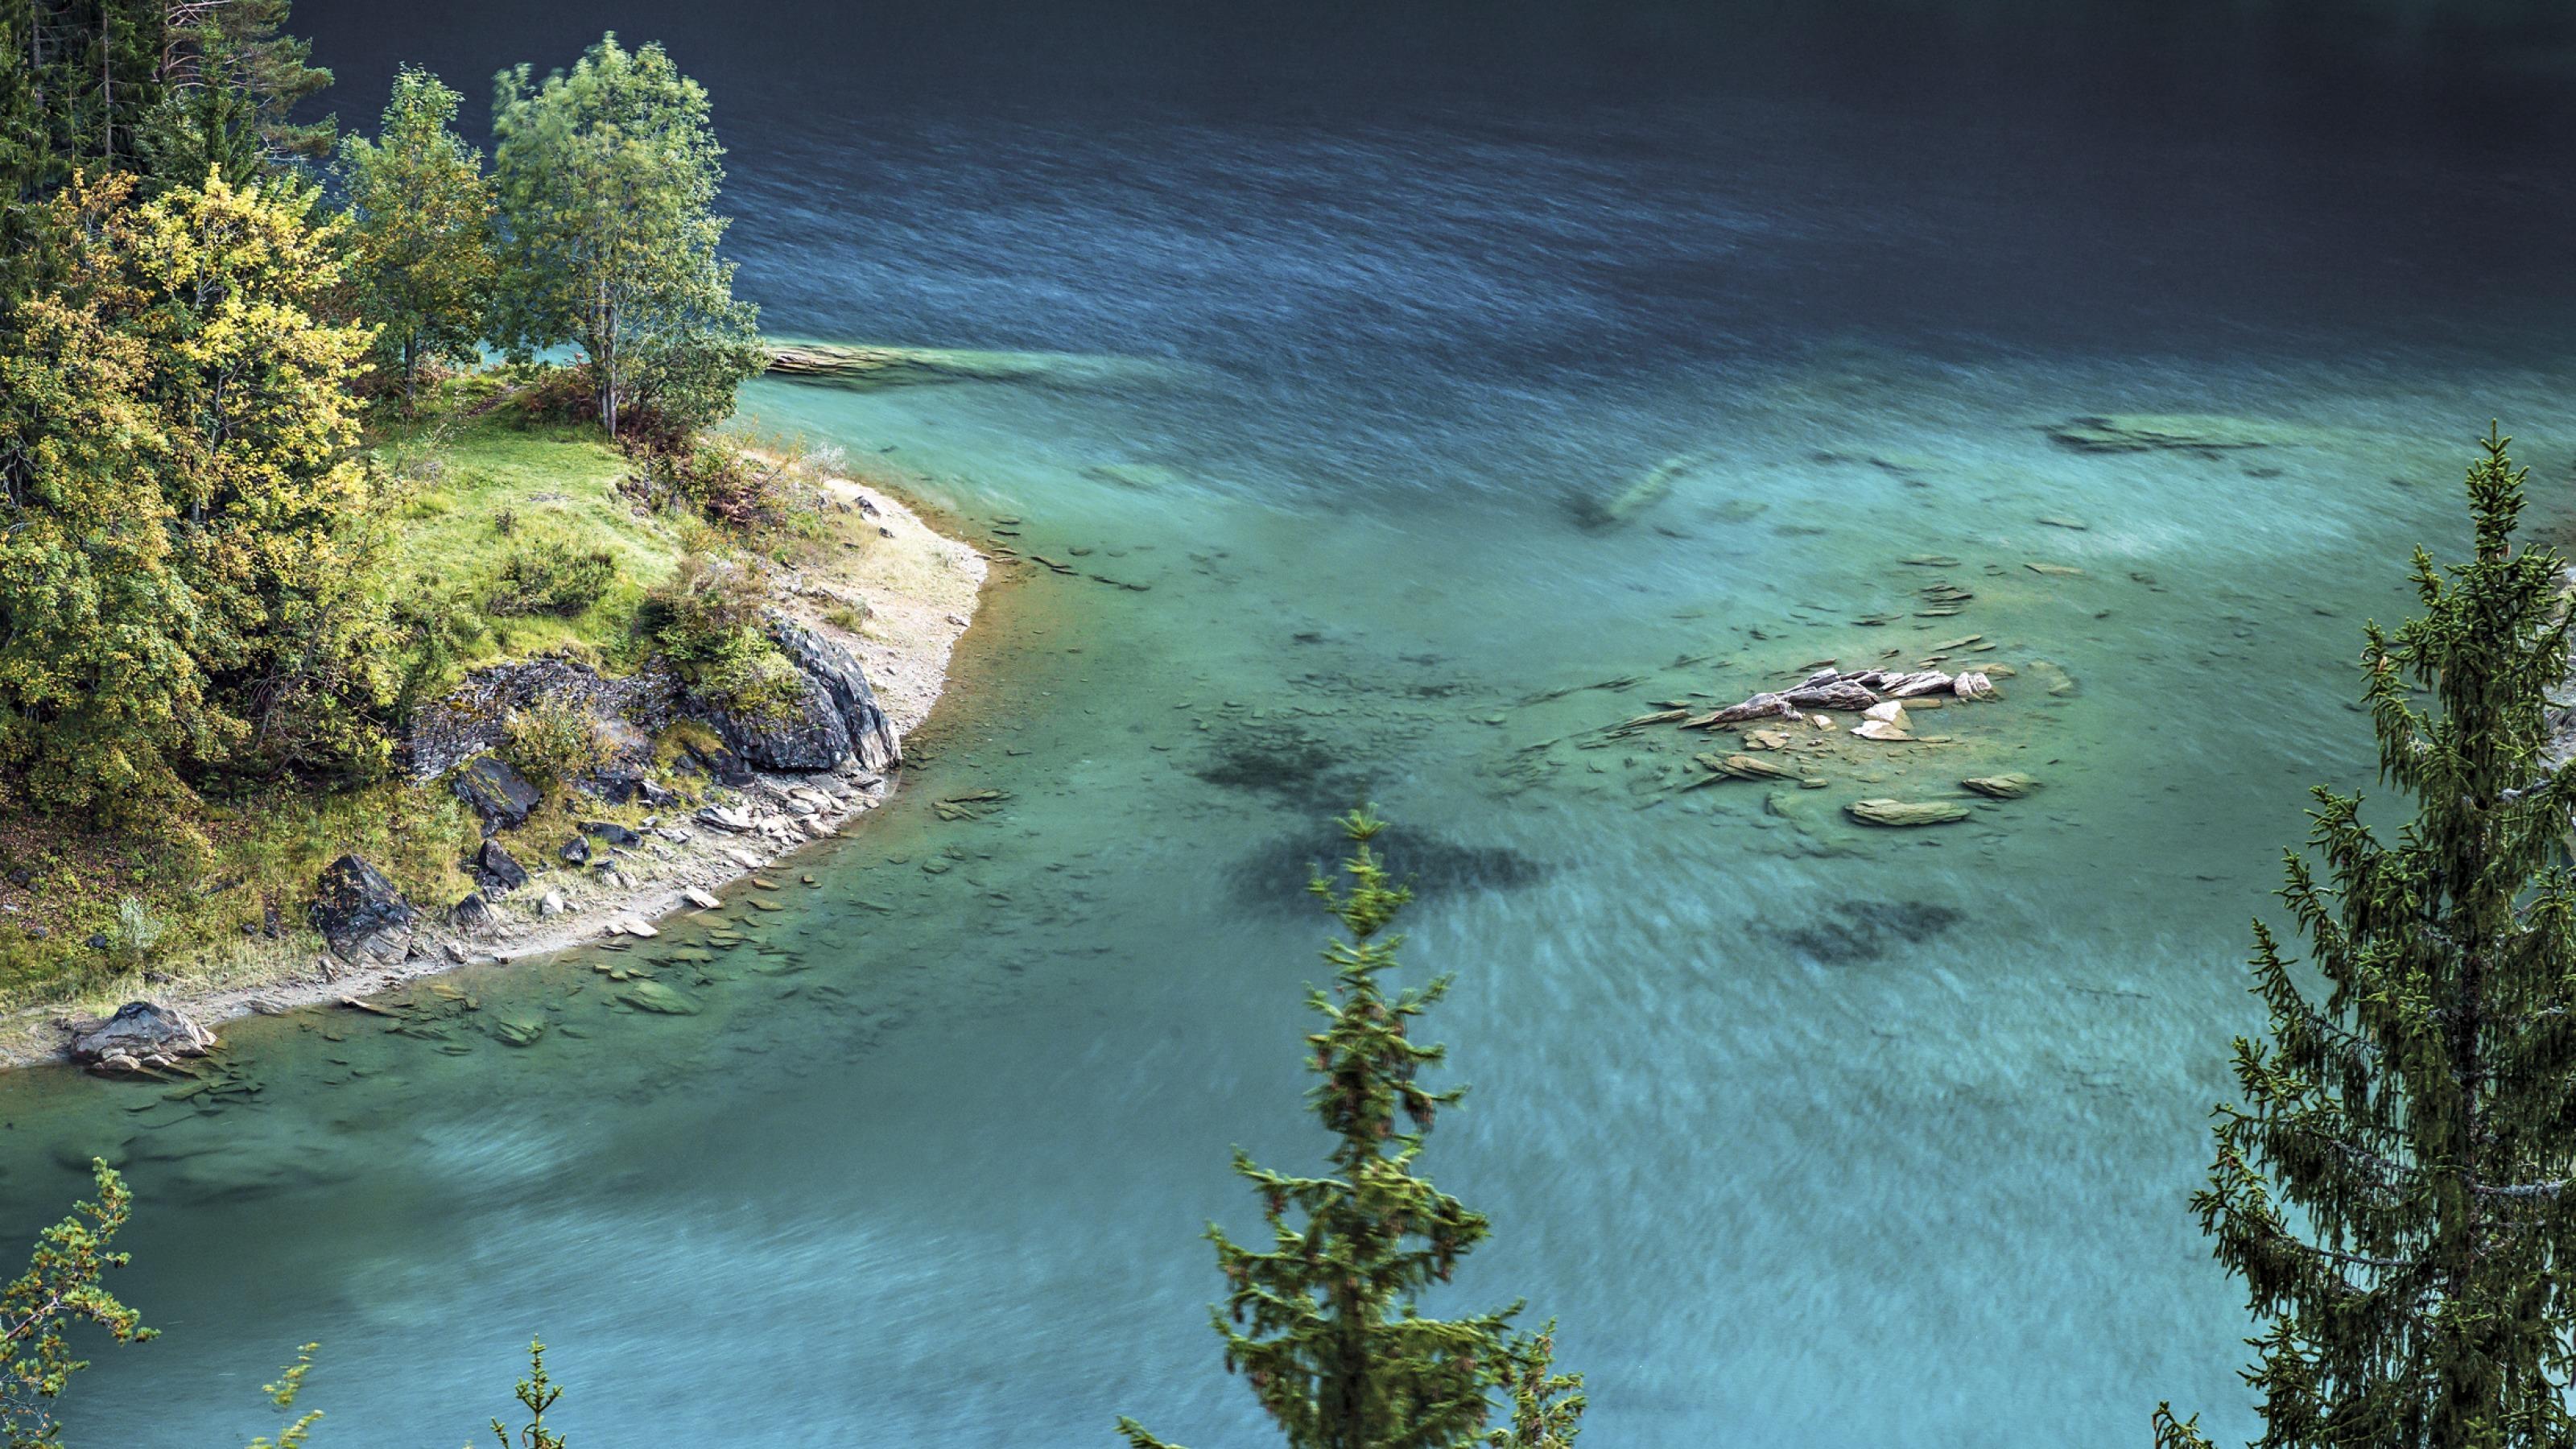 Senda Ruinaulta: de Zwitserse Rijnkloofroute | Zwitserland Toerisme